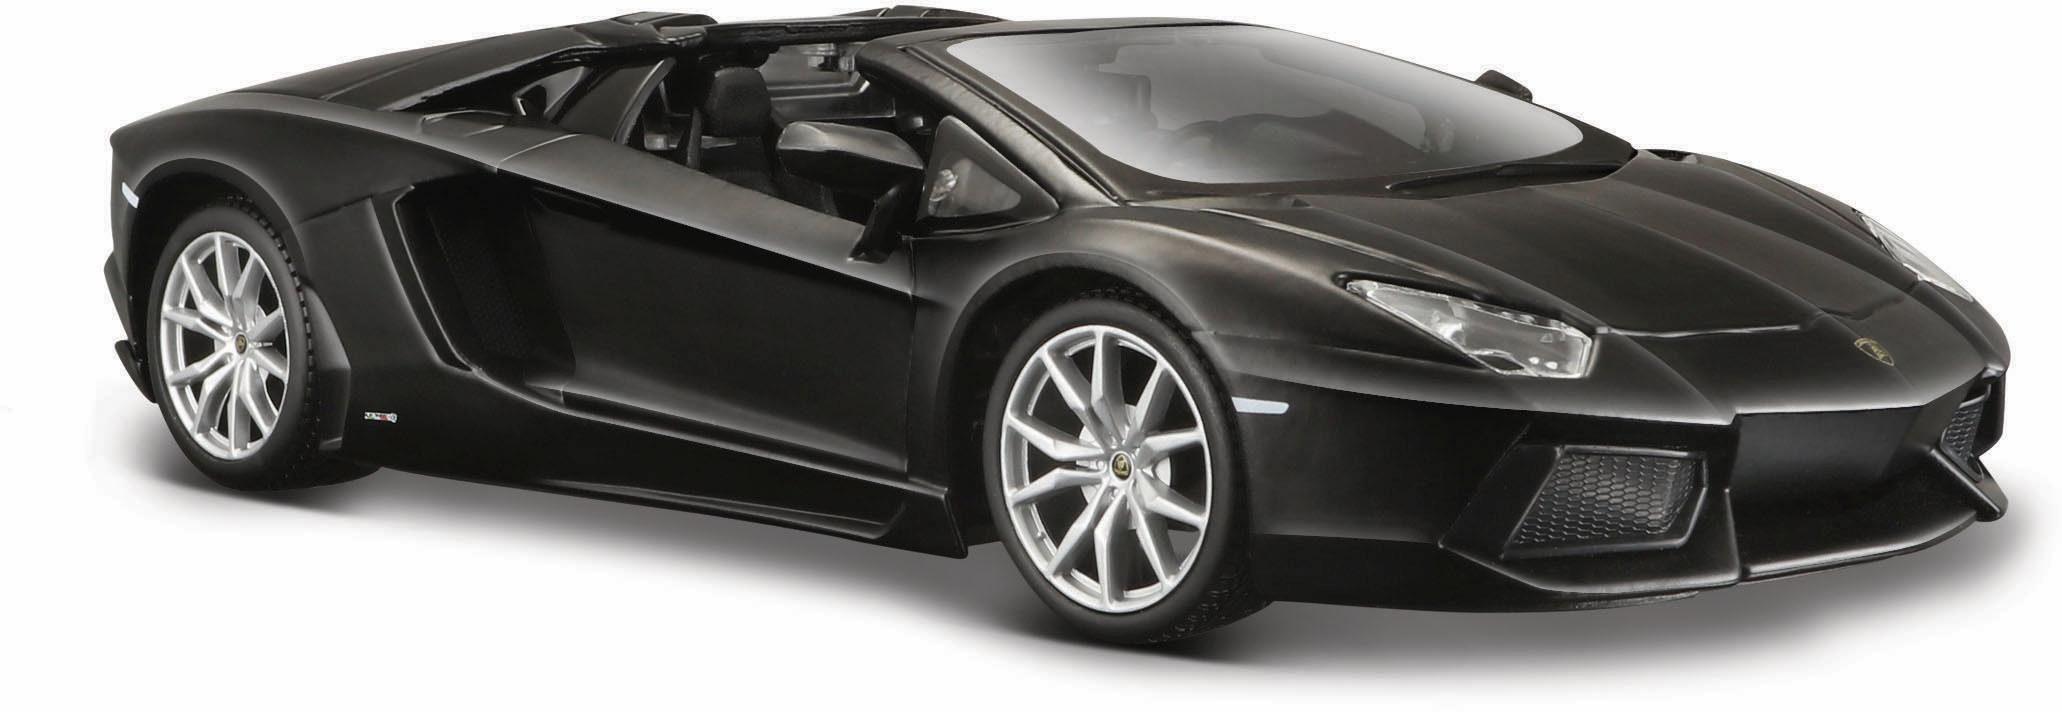 Maisto® Sammlerauto, »Dull Black Collection, Lamborghini Aventador LP-700-4 Roadster«, 1:24, schwarz«